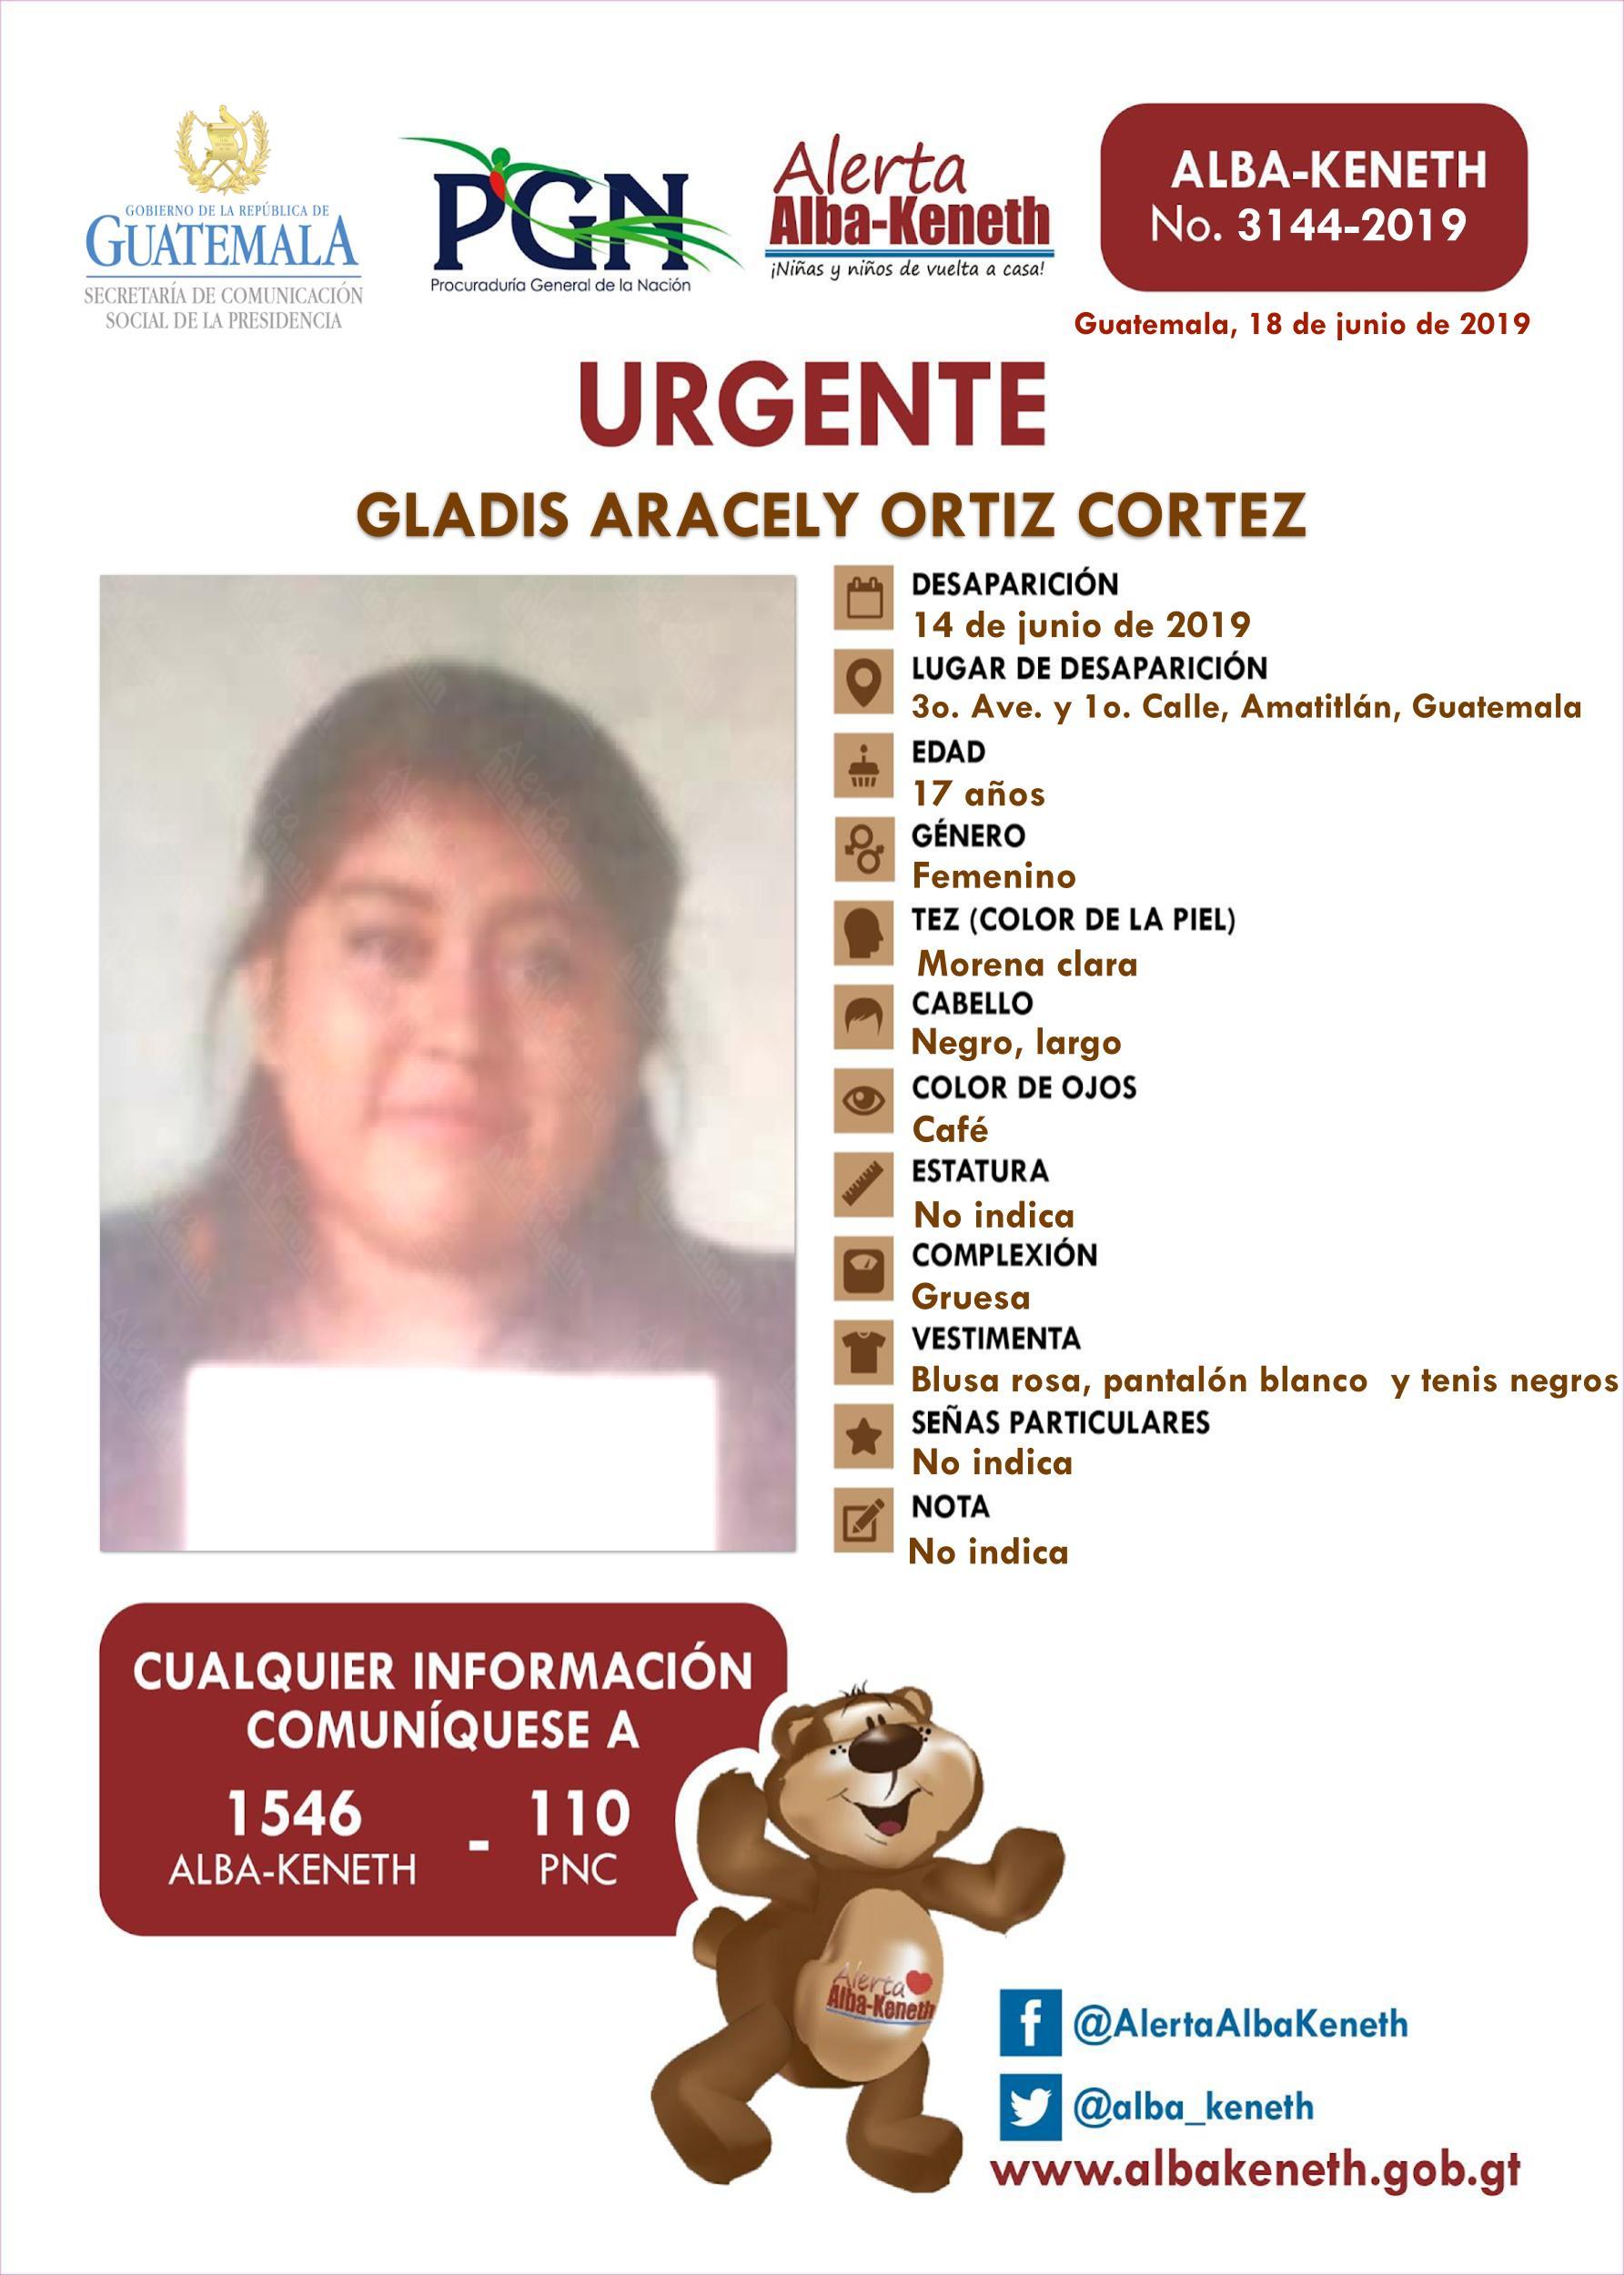 Gladis Aracely Ortiz Cortez